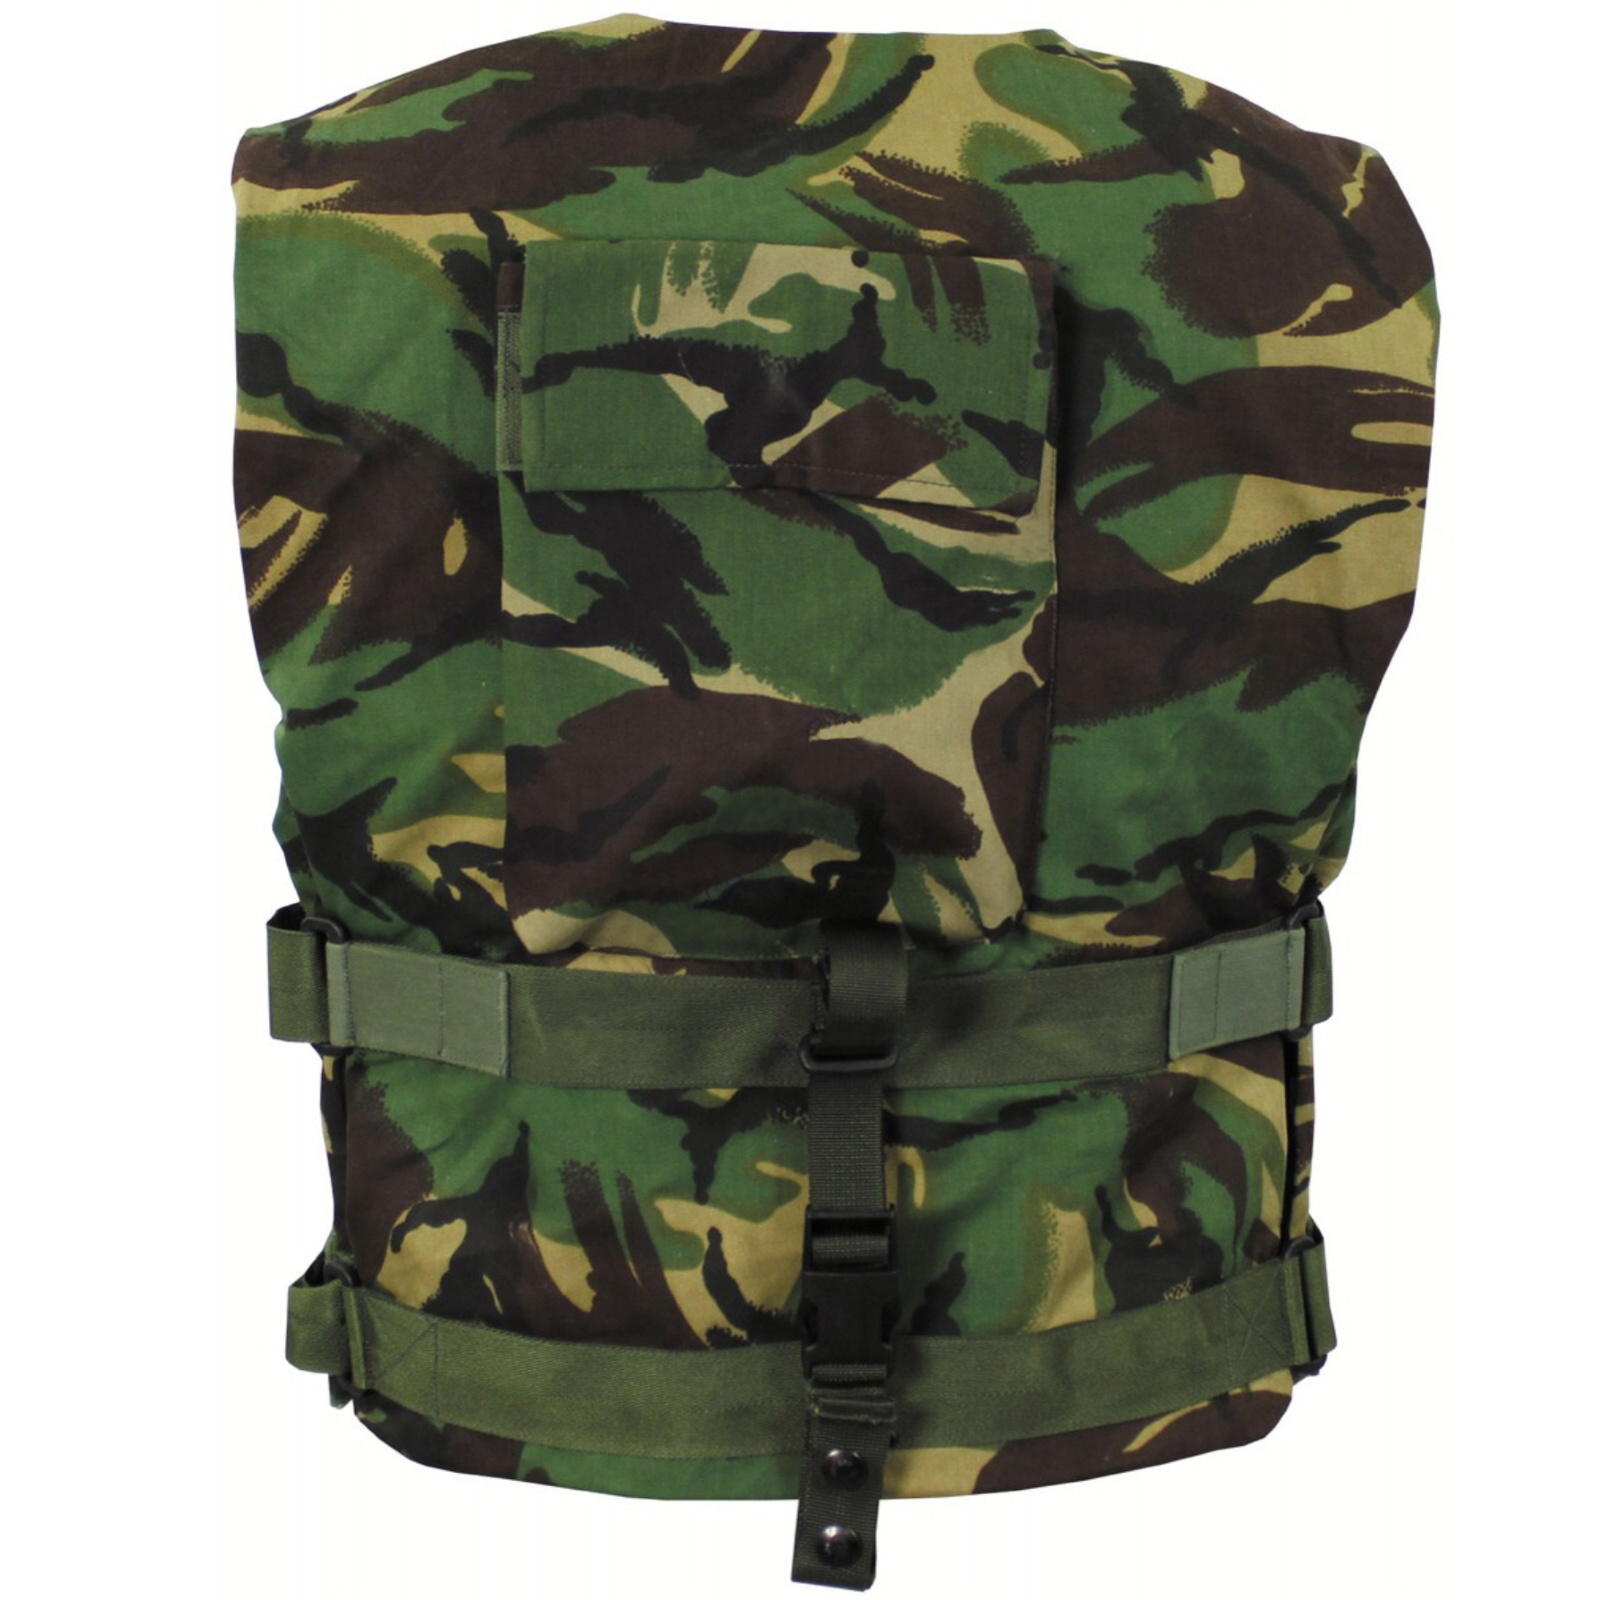 AO Tactical Gear Taktische Schutzweste GB - DPM